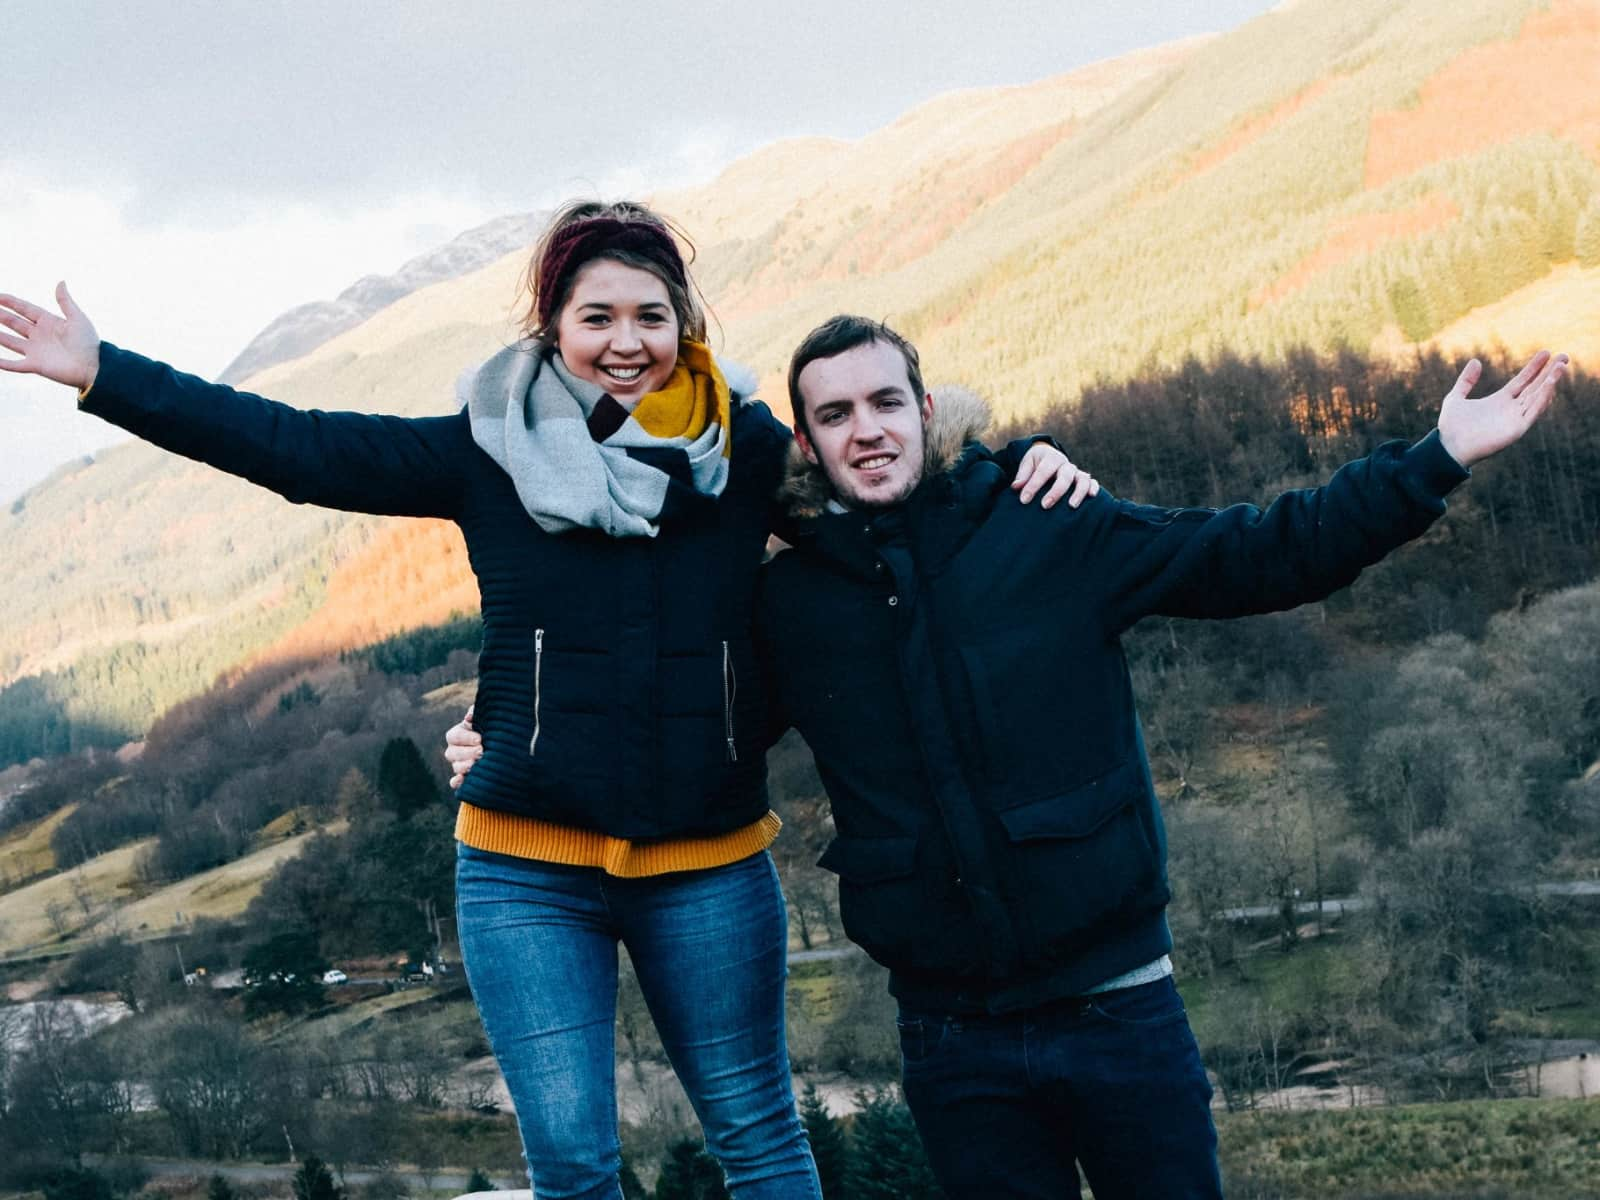 Rebecca & Ben from Llanfairpwllgwyngyll, United Kingdom